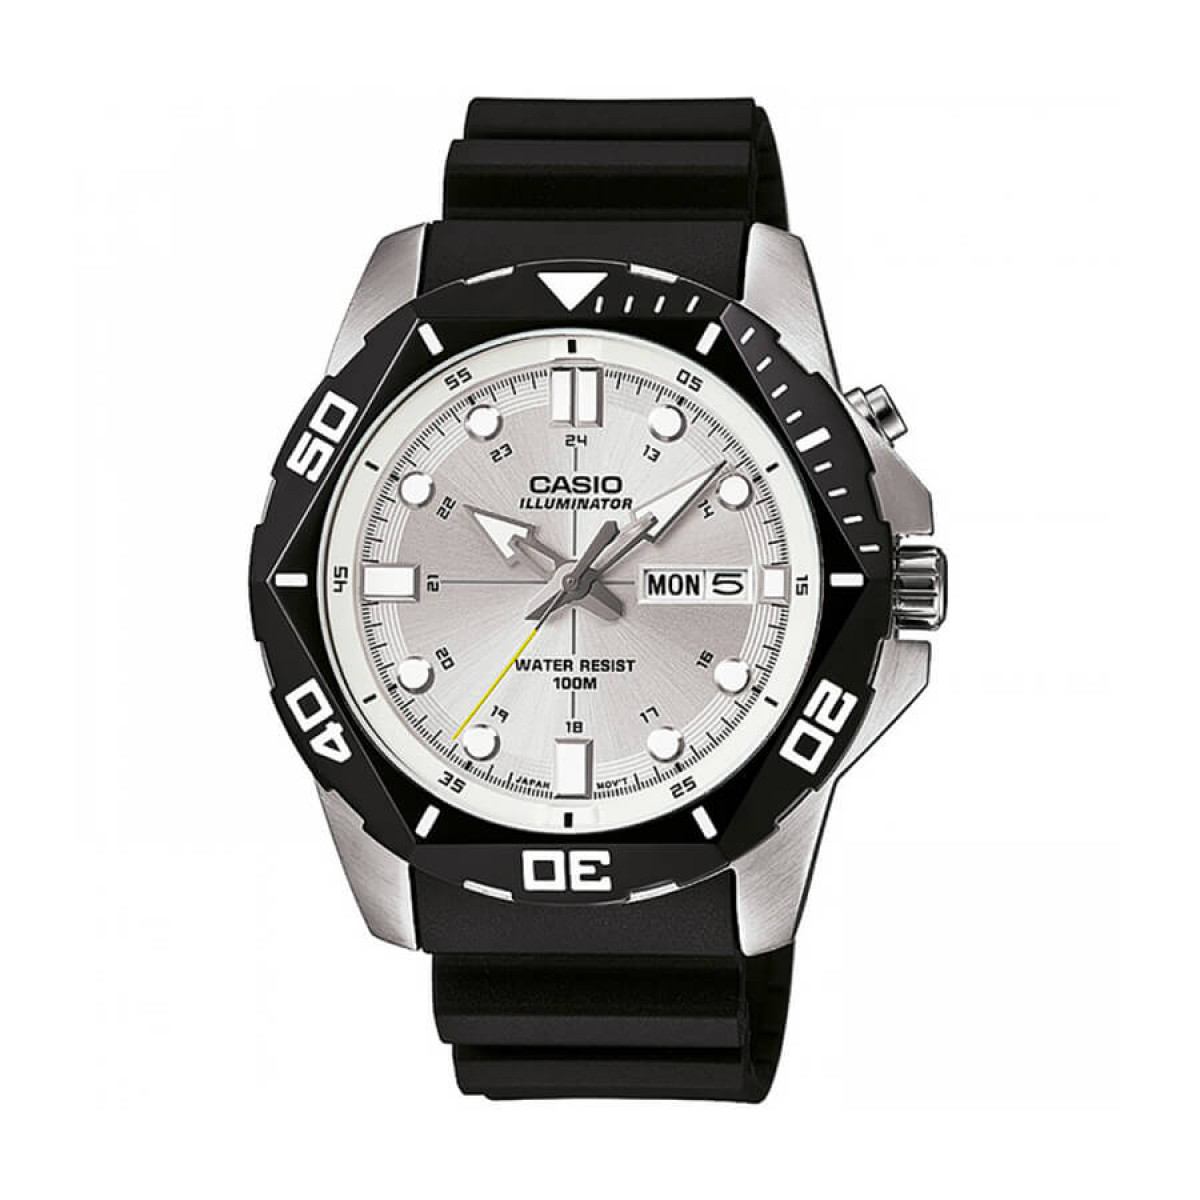 Часовник Casio MTD-1080-7AVEF